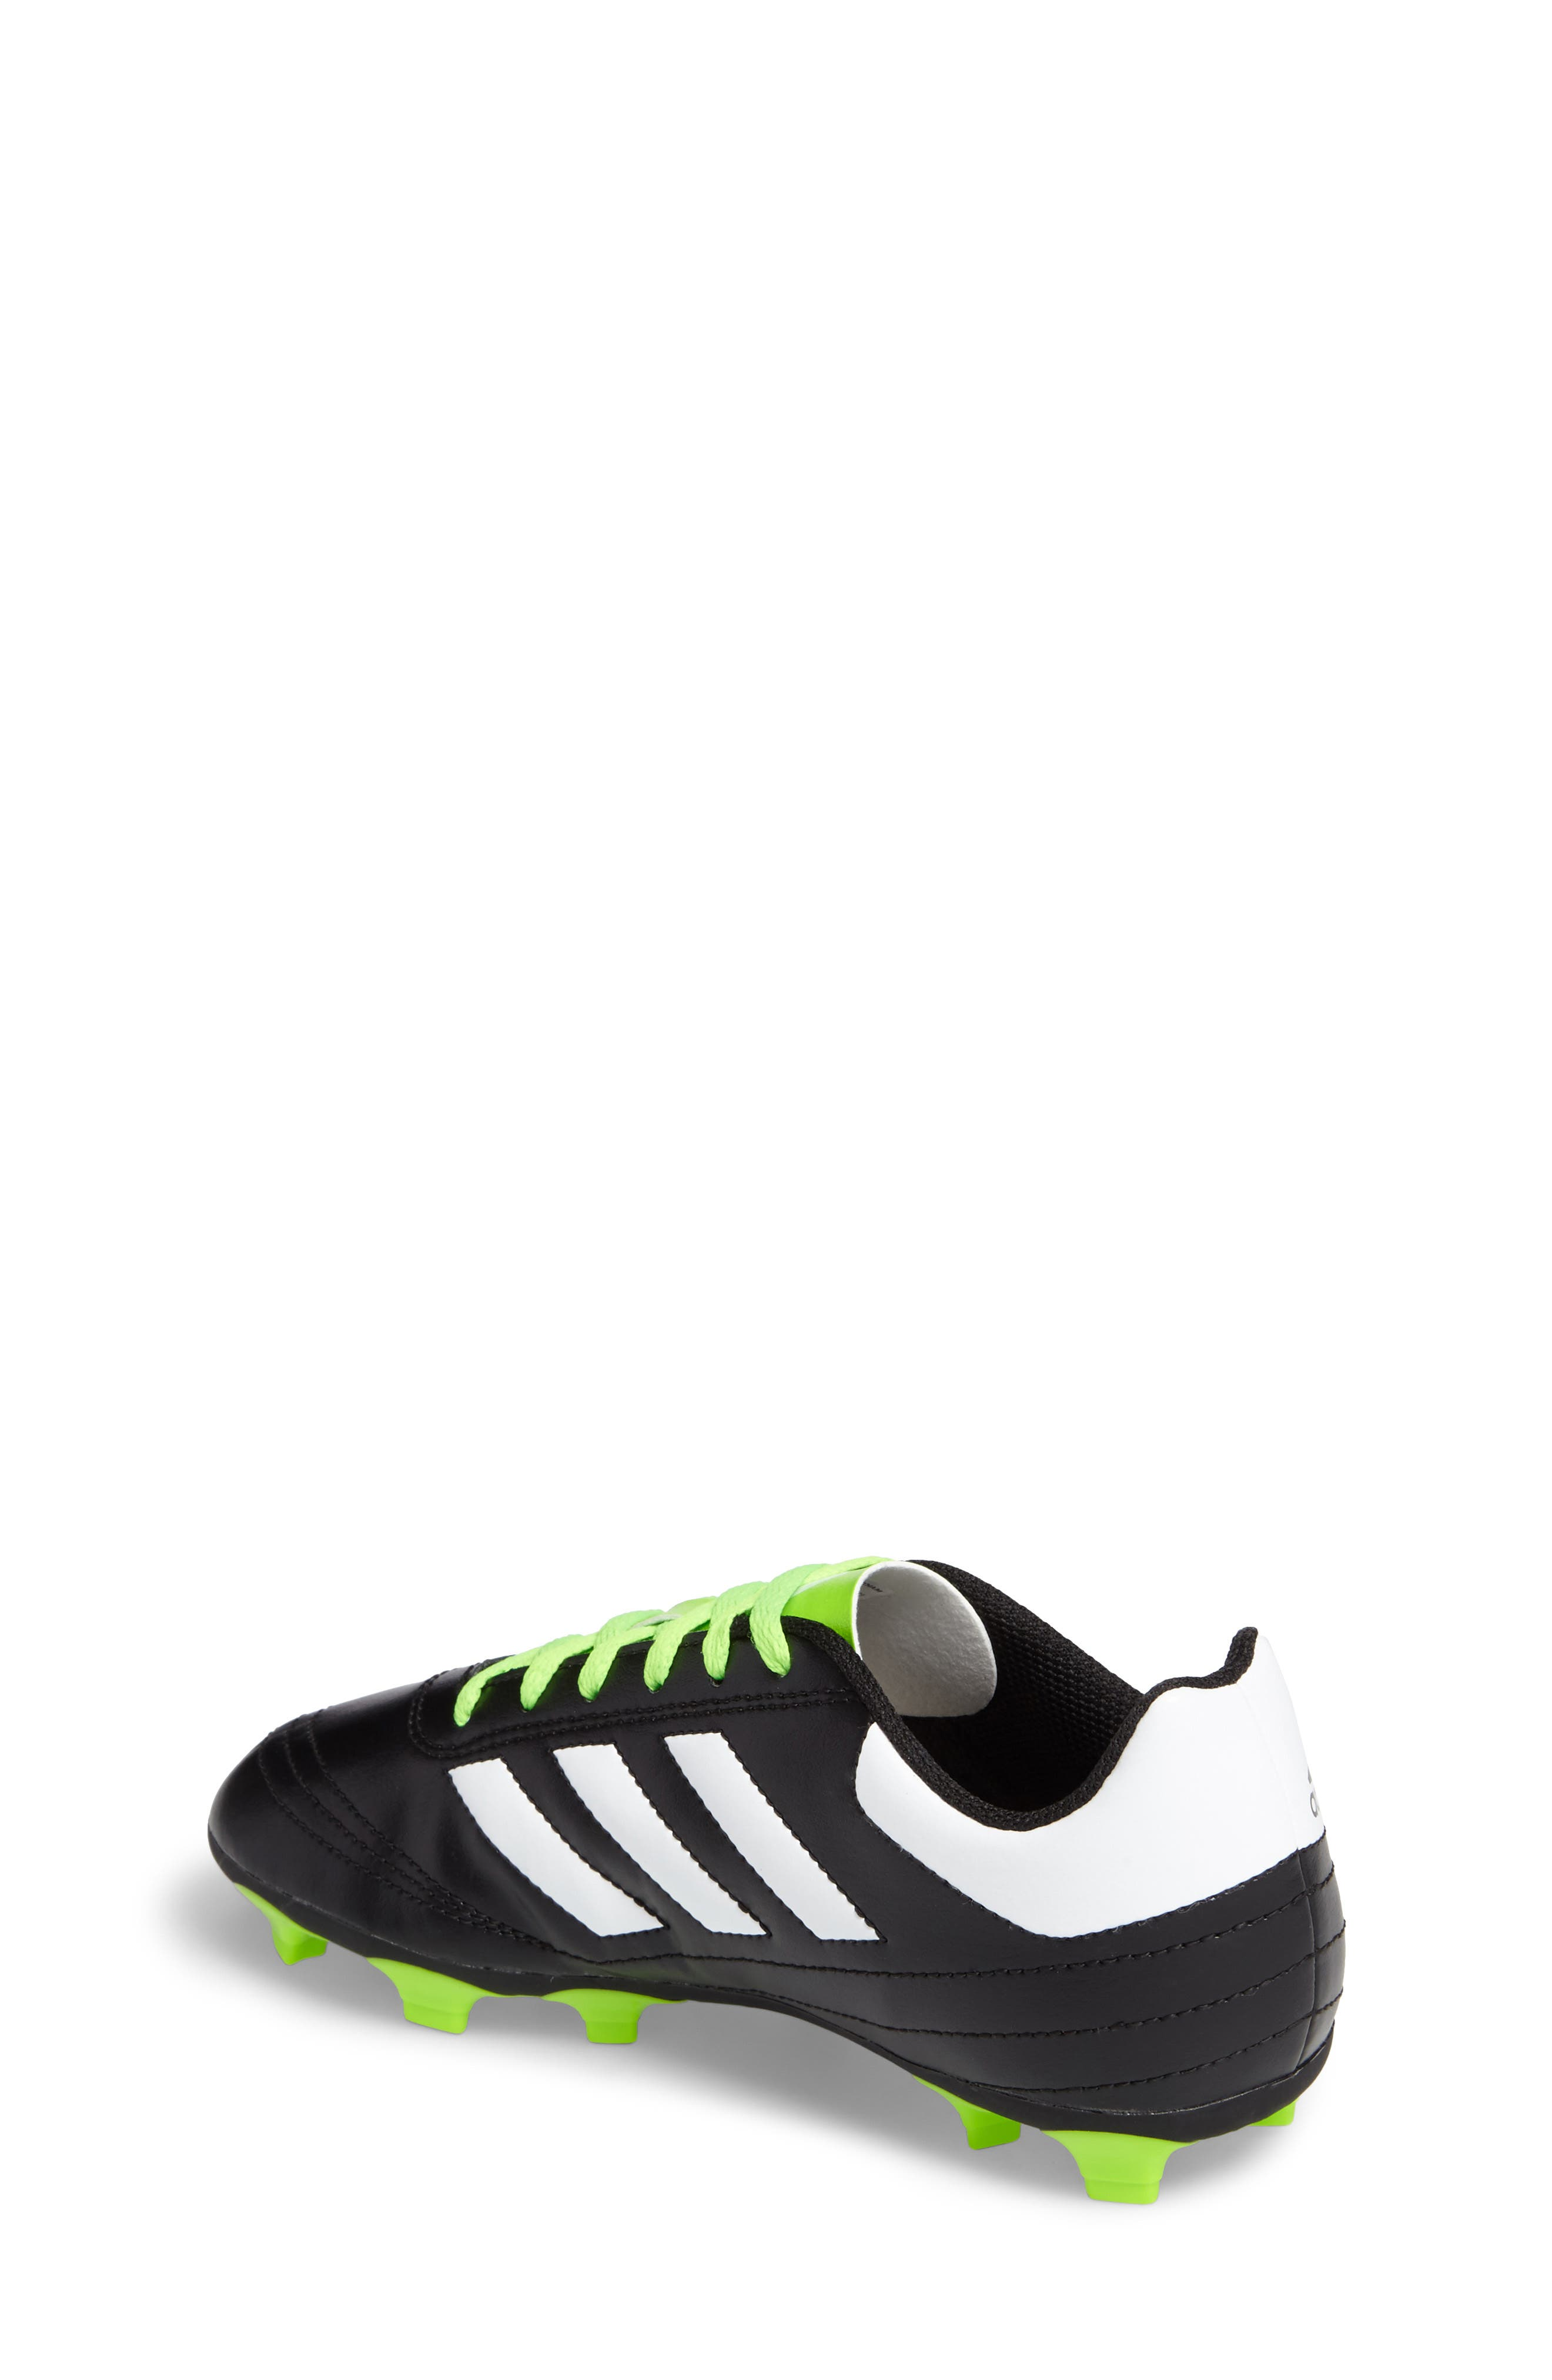 Alternate Image 3  - adidas Goletto VI Soccer Shoe (Toddler, Little Kid & Big Kid)